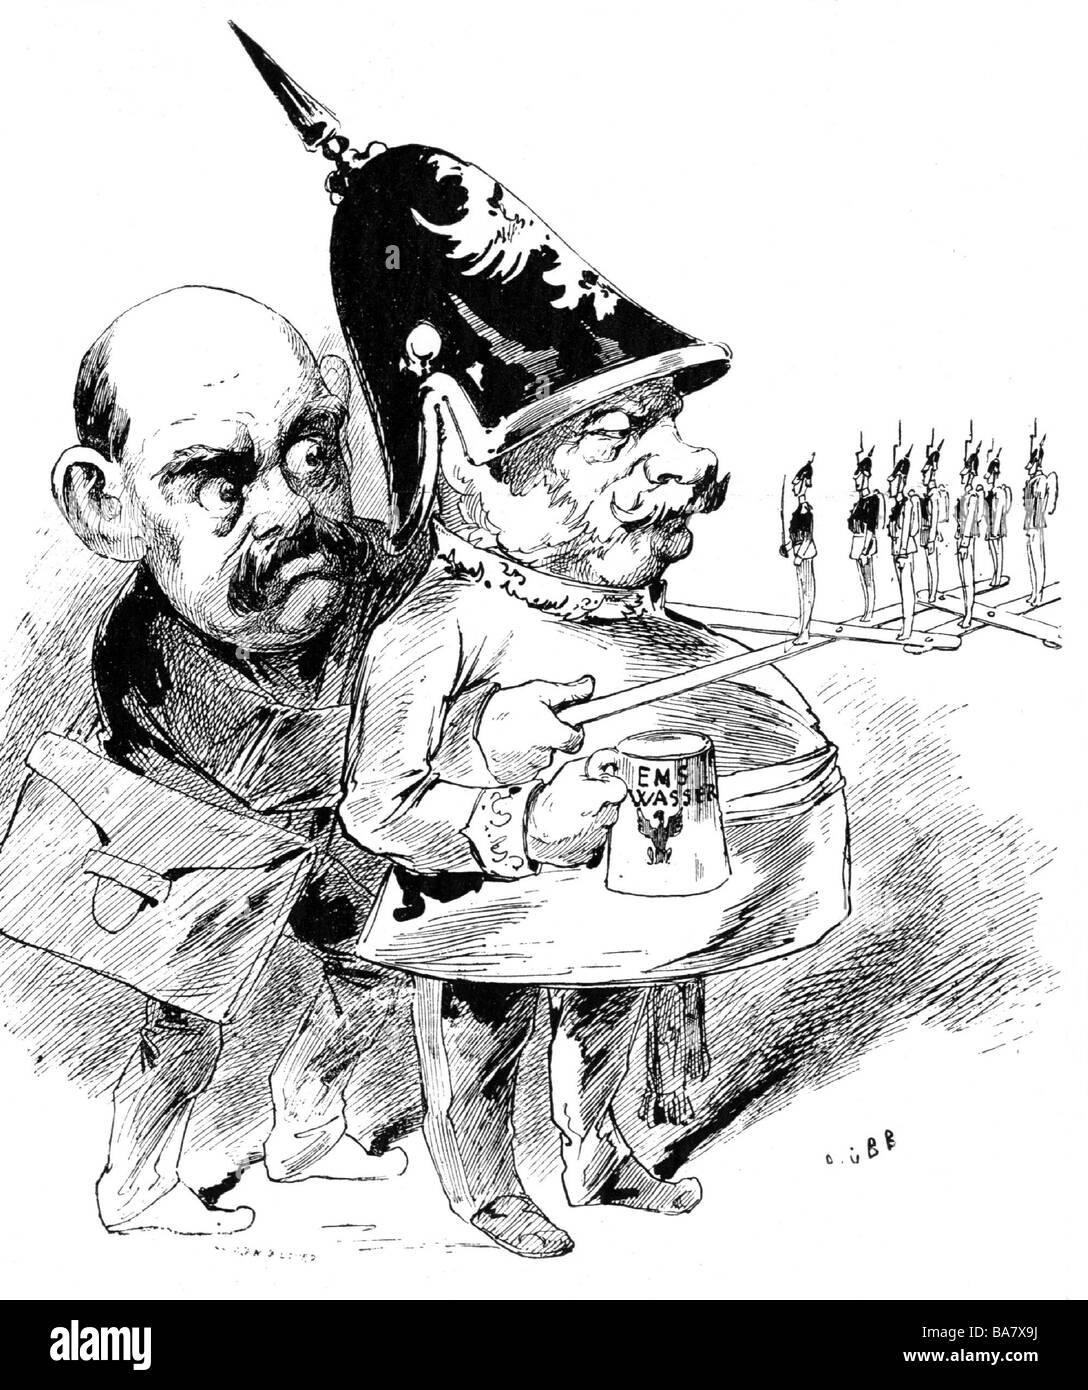 Bismarck, Otto von, 1.4.1815 - 30.7.1898, German politician, caricature, 'Bismarck Le roi de Prusse', drawing, - Stock Image